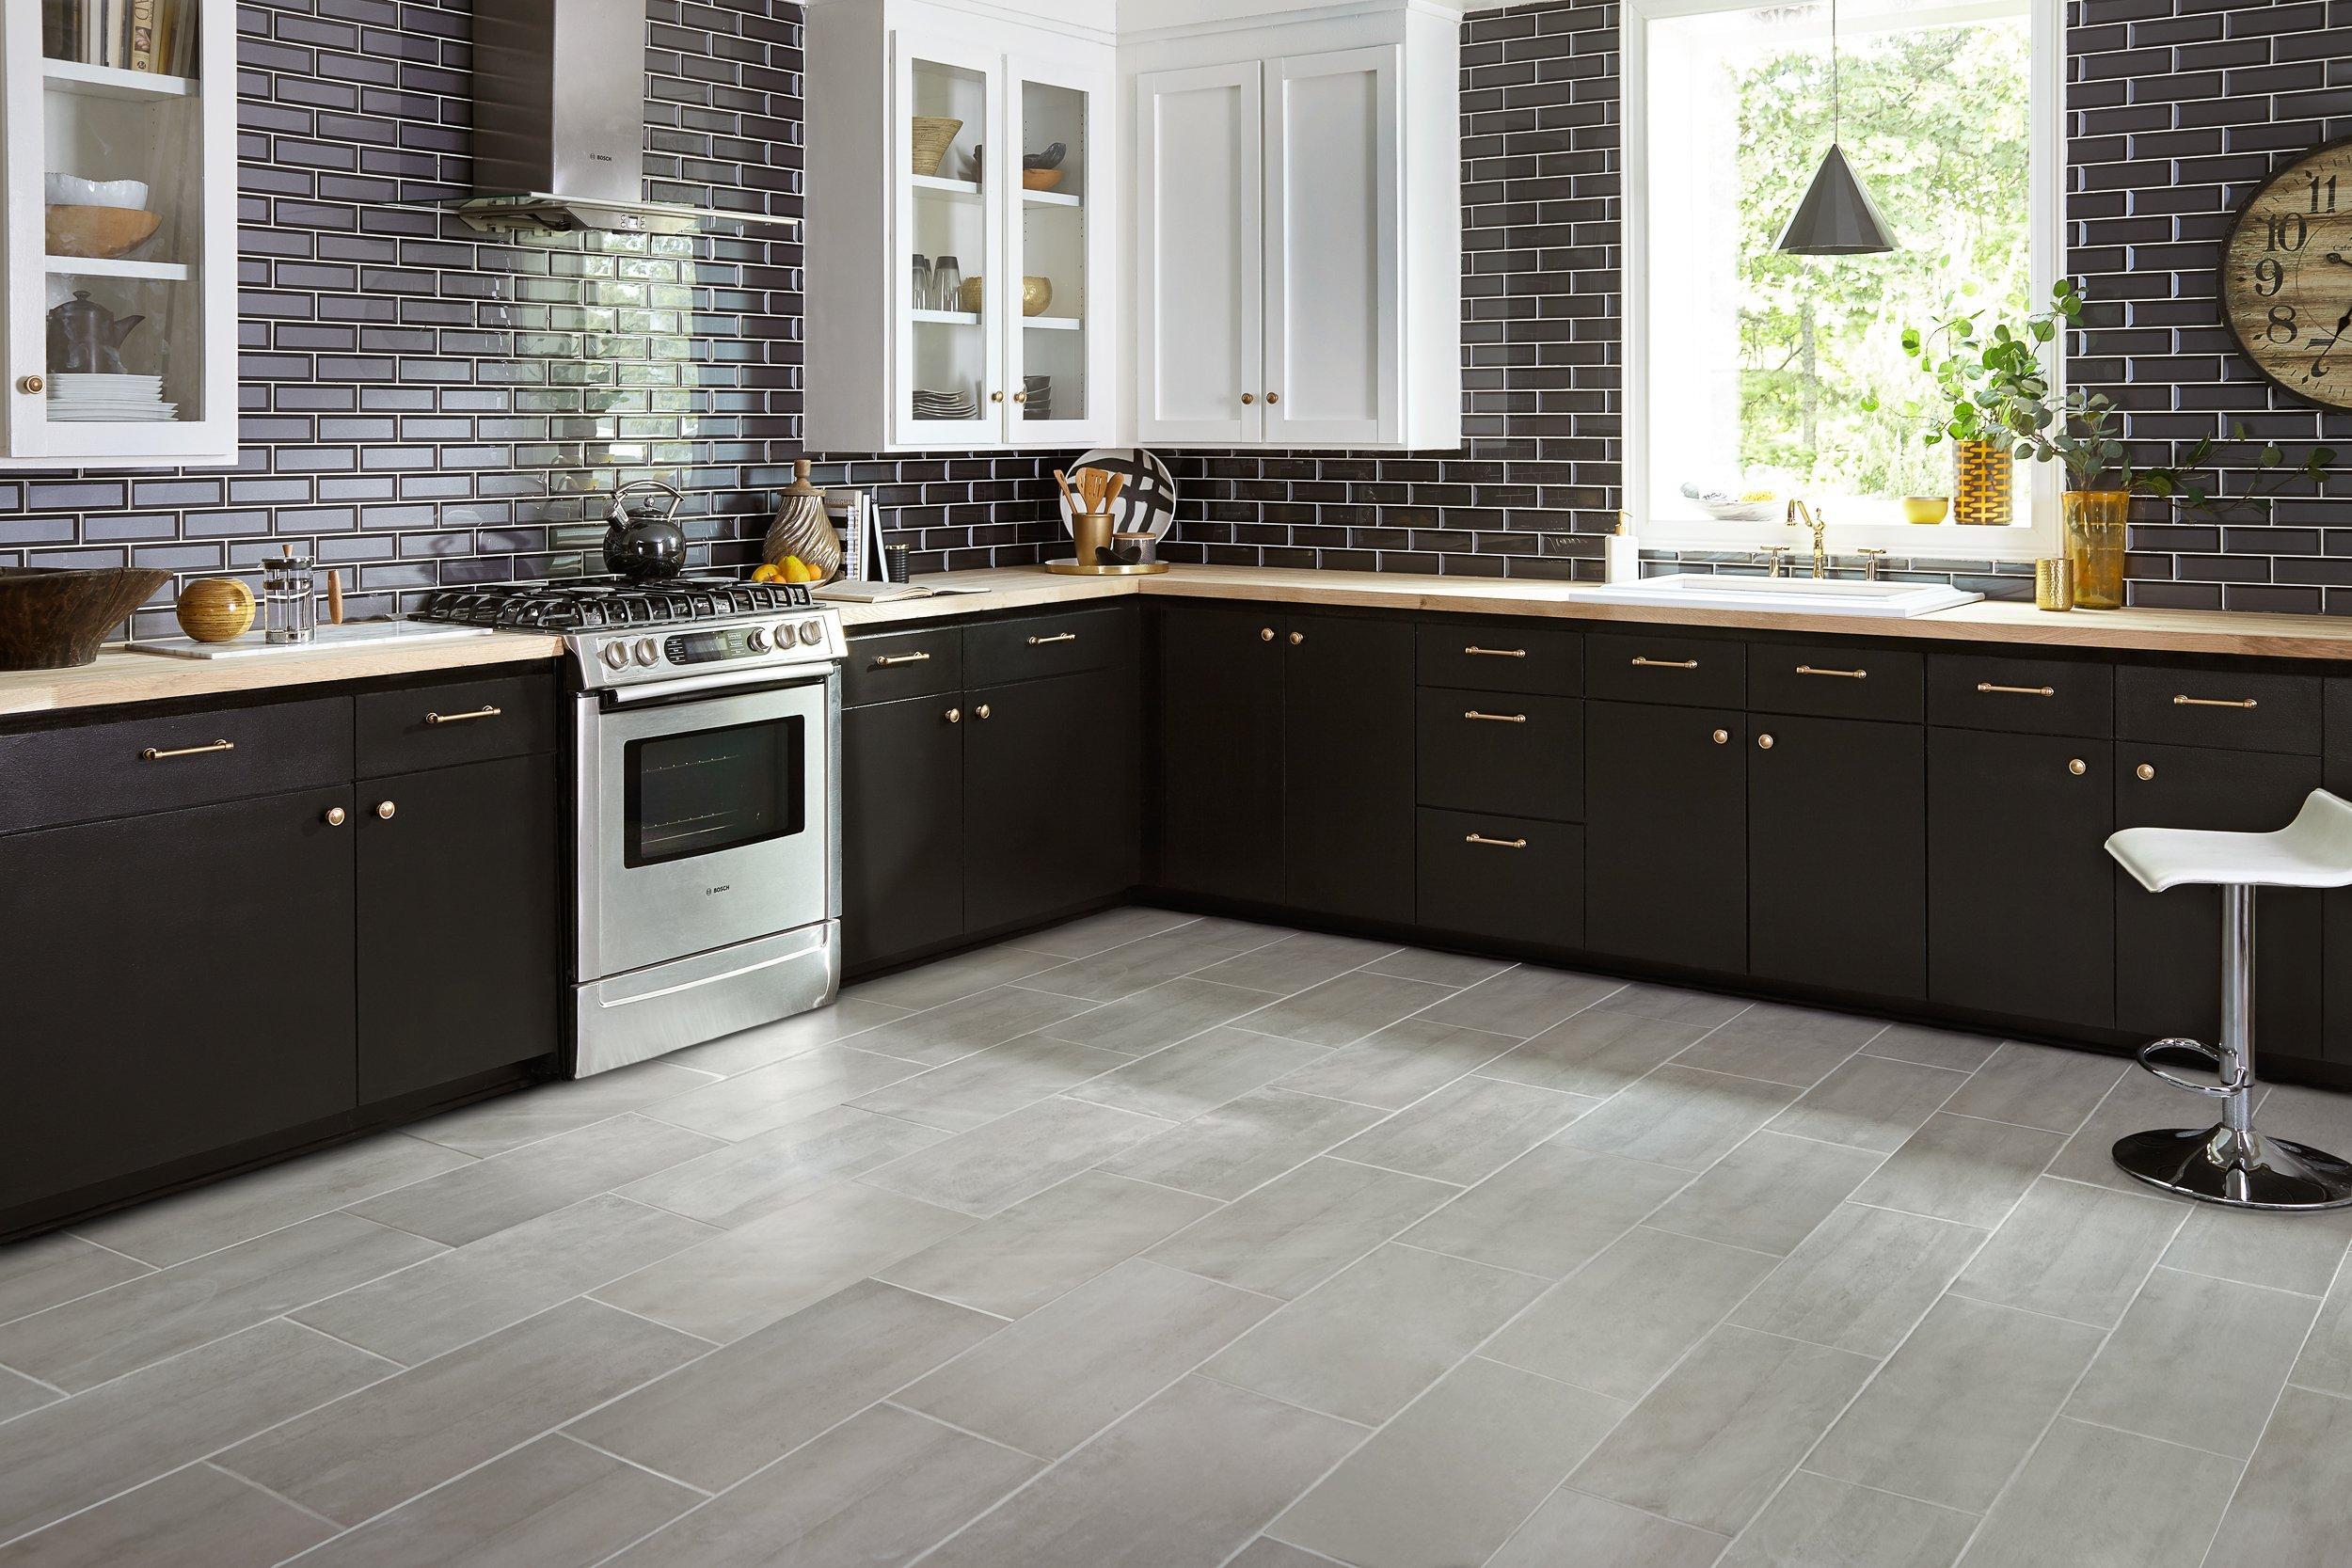 grey kitchen tile cape cod design ideas concrete gray ceramic 12 x 24 100136795 floor and decor tap to zoom